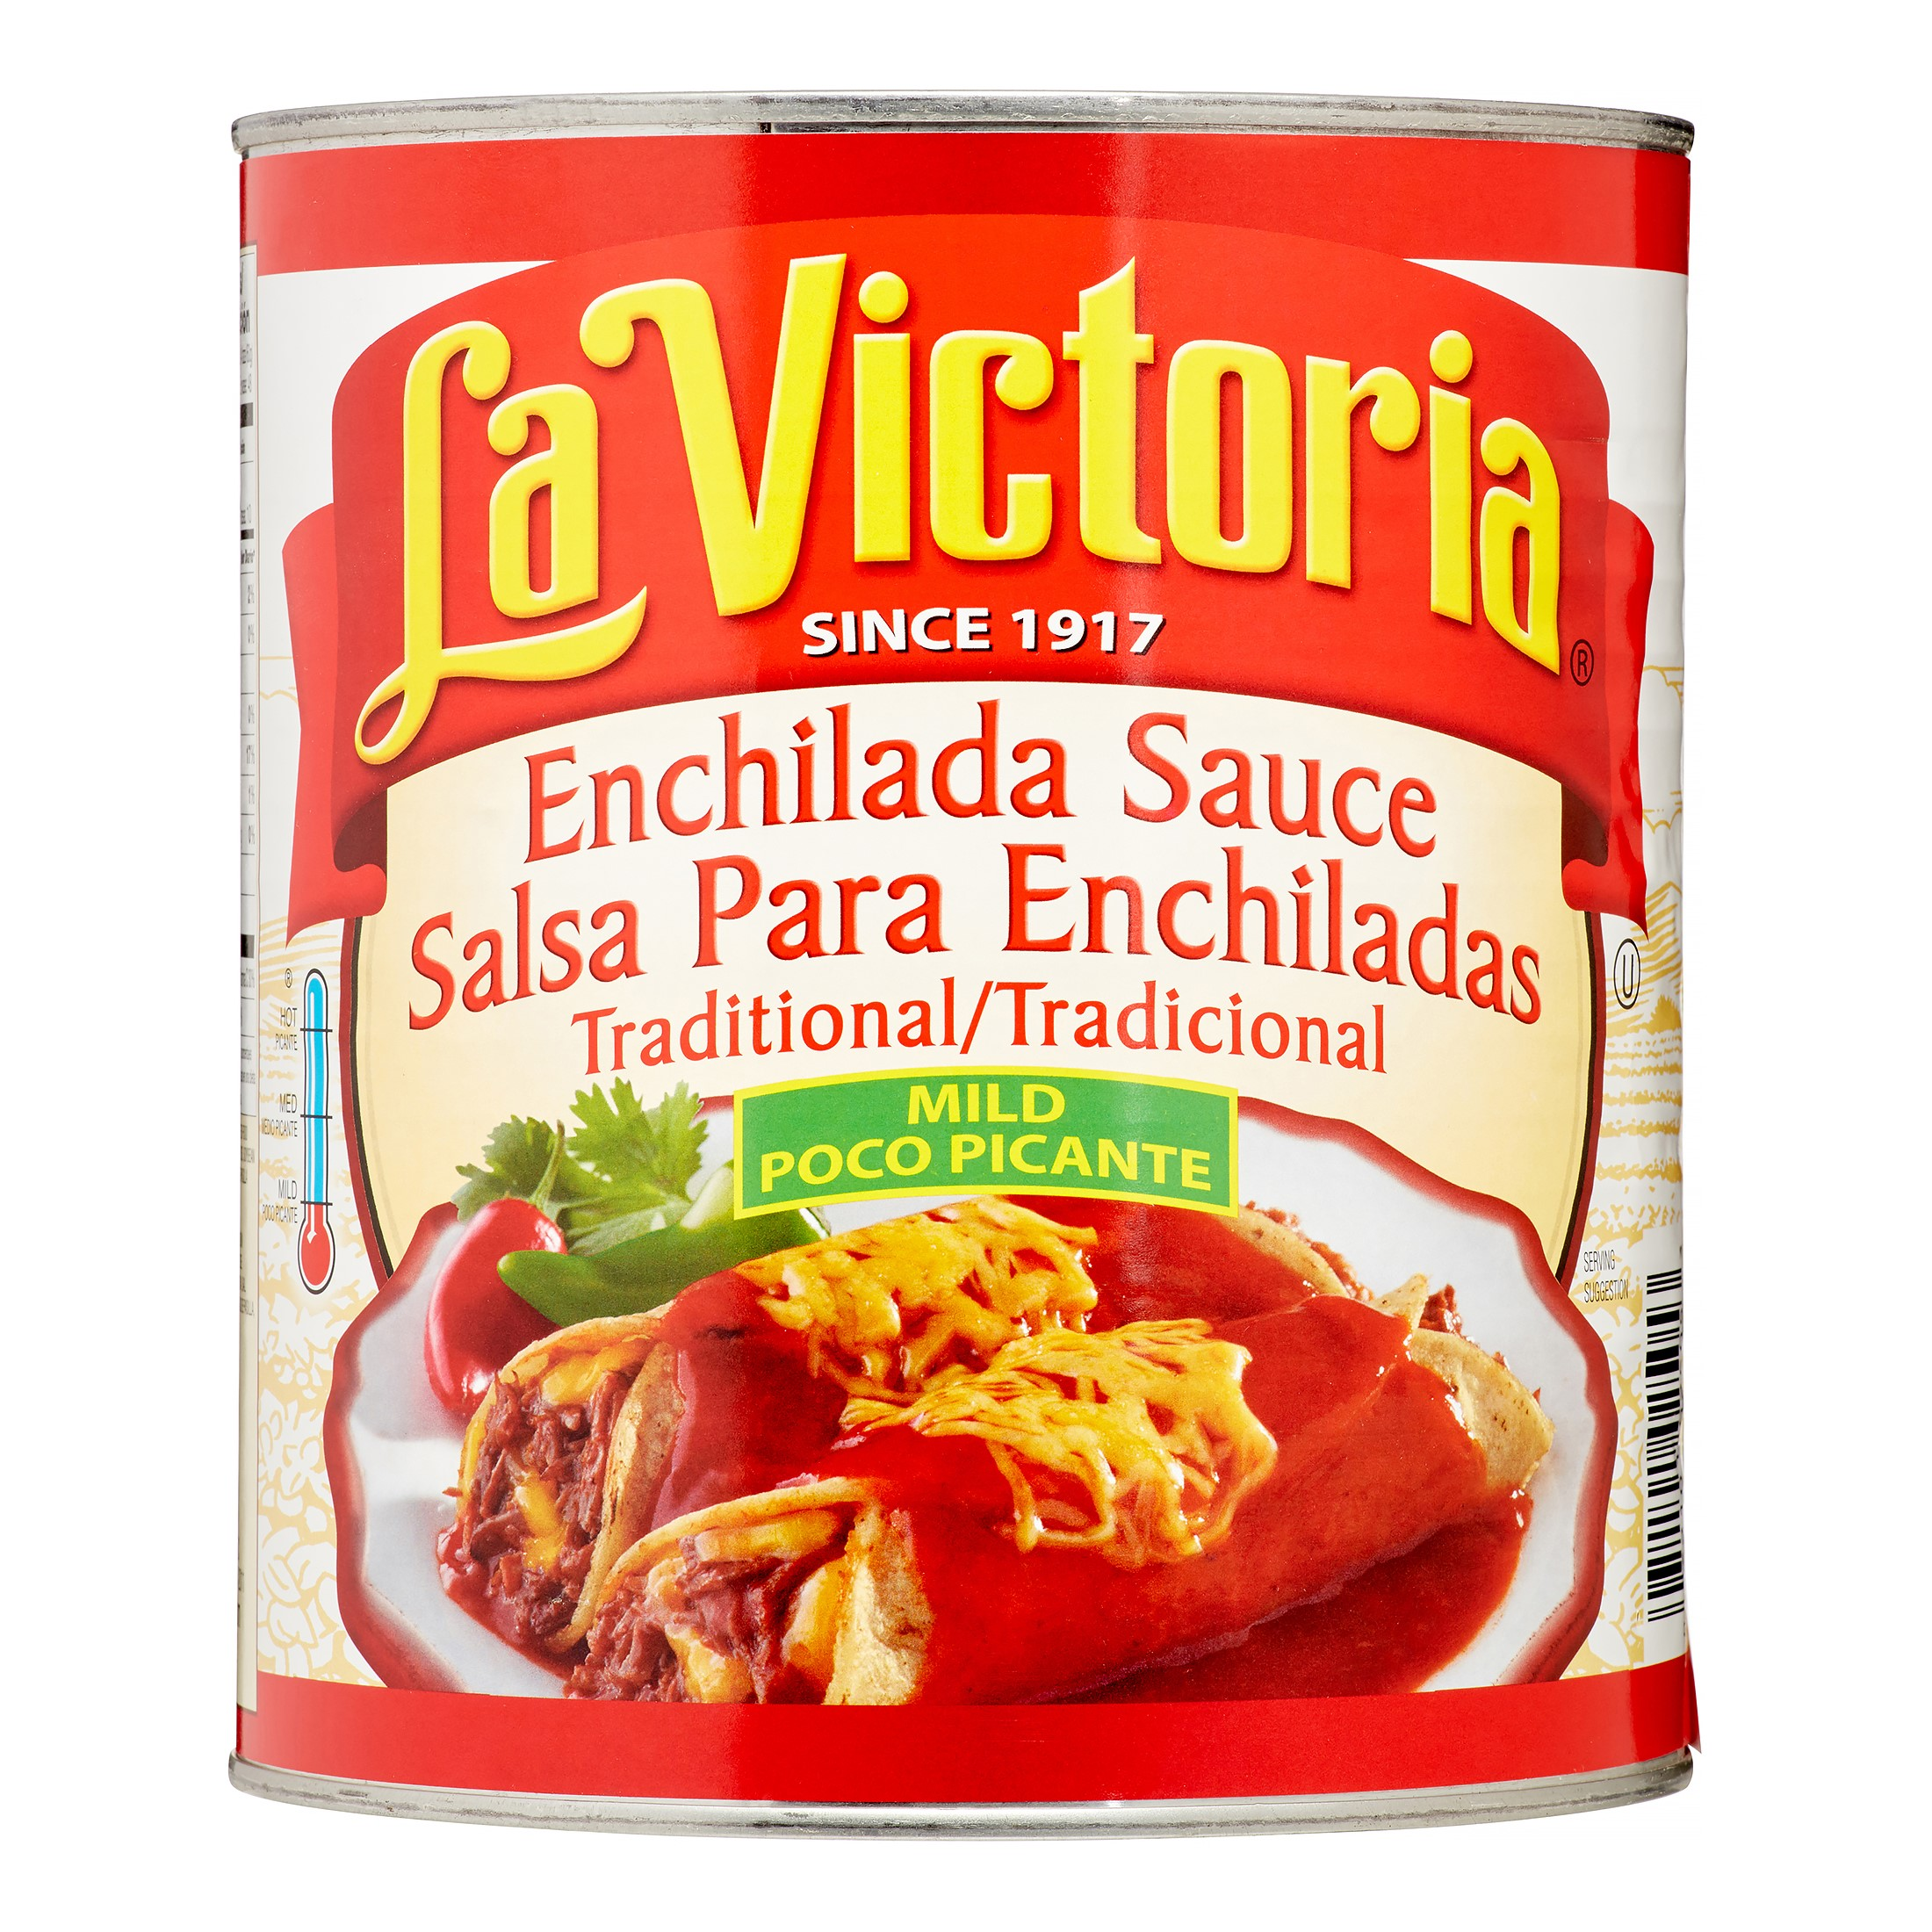 La Victoria Enchilada Sauce, Mild Red, 102 Oz